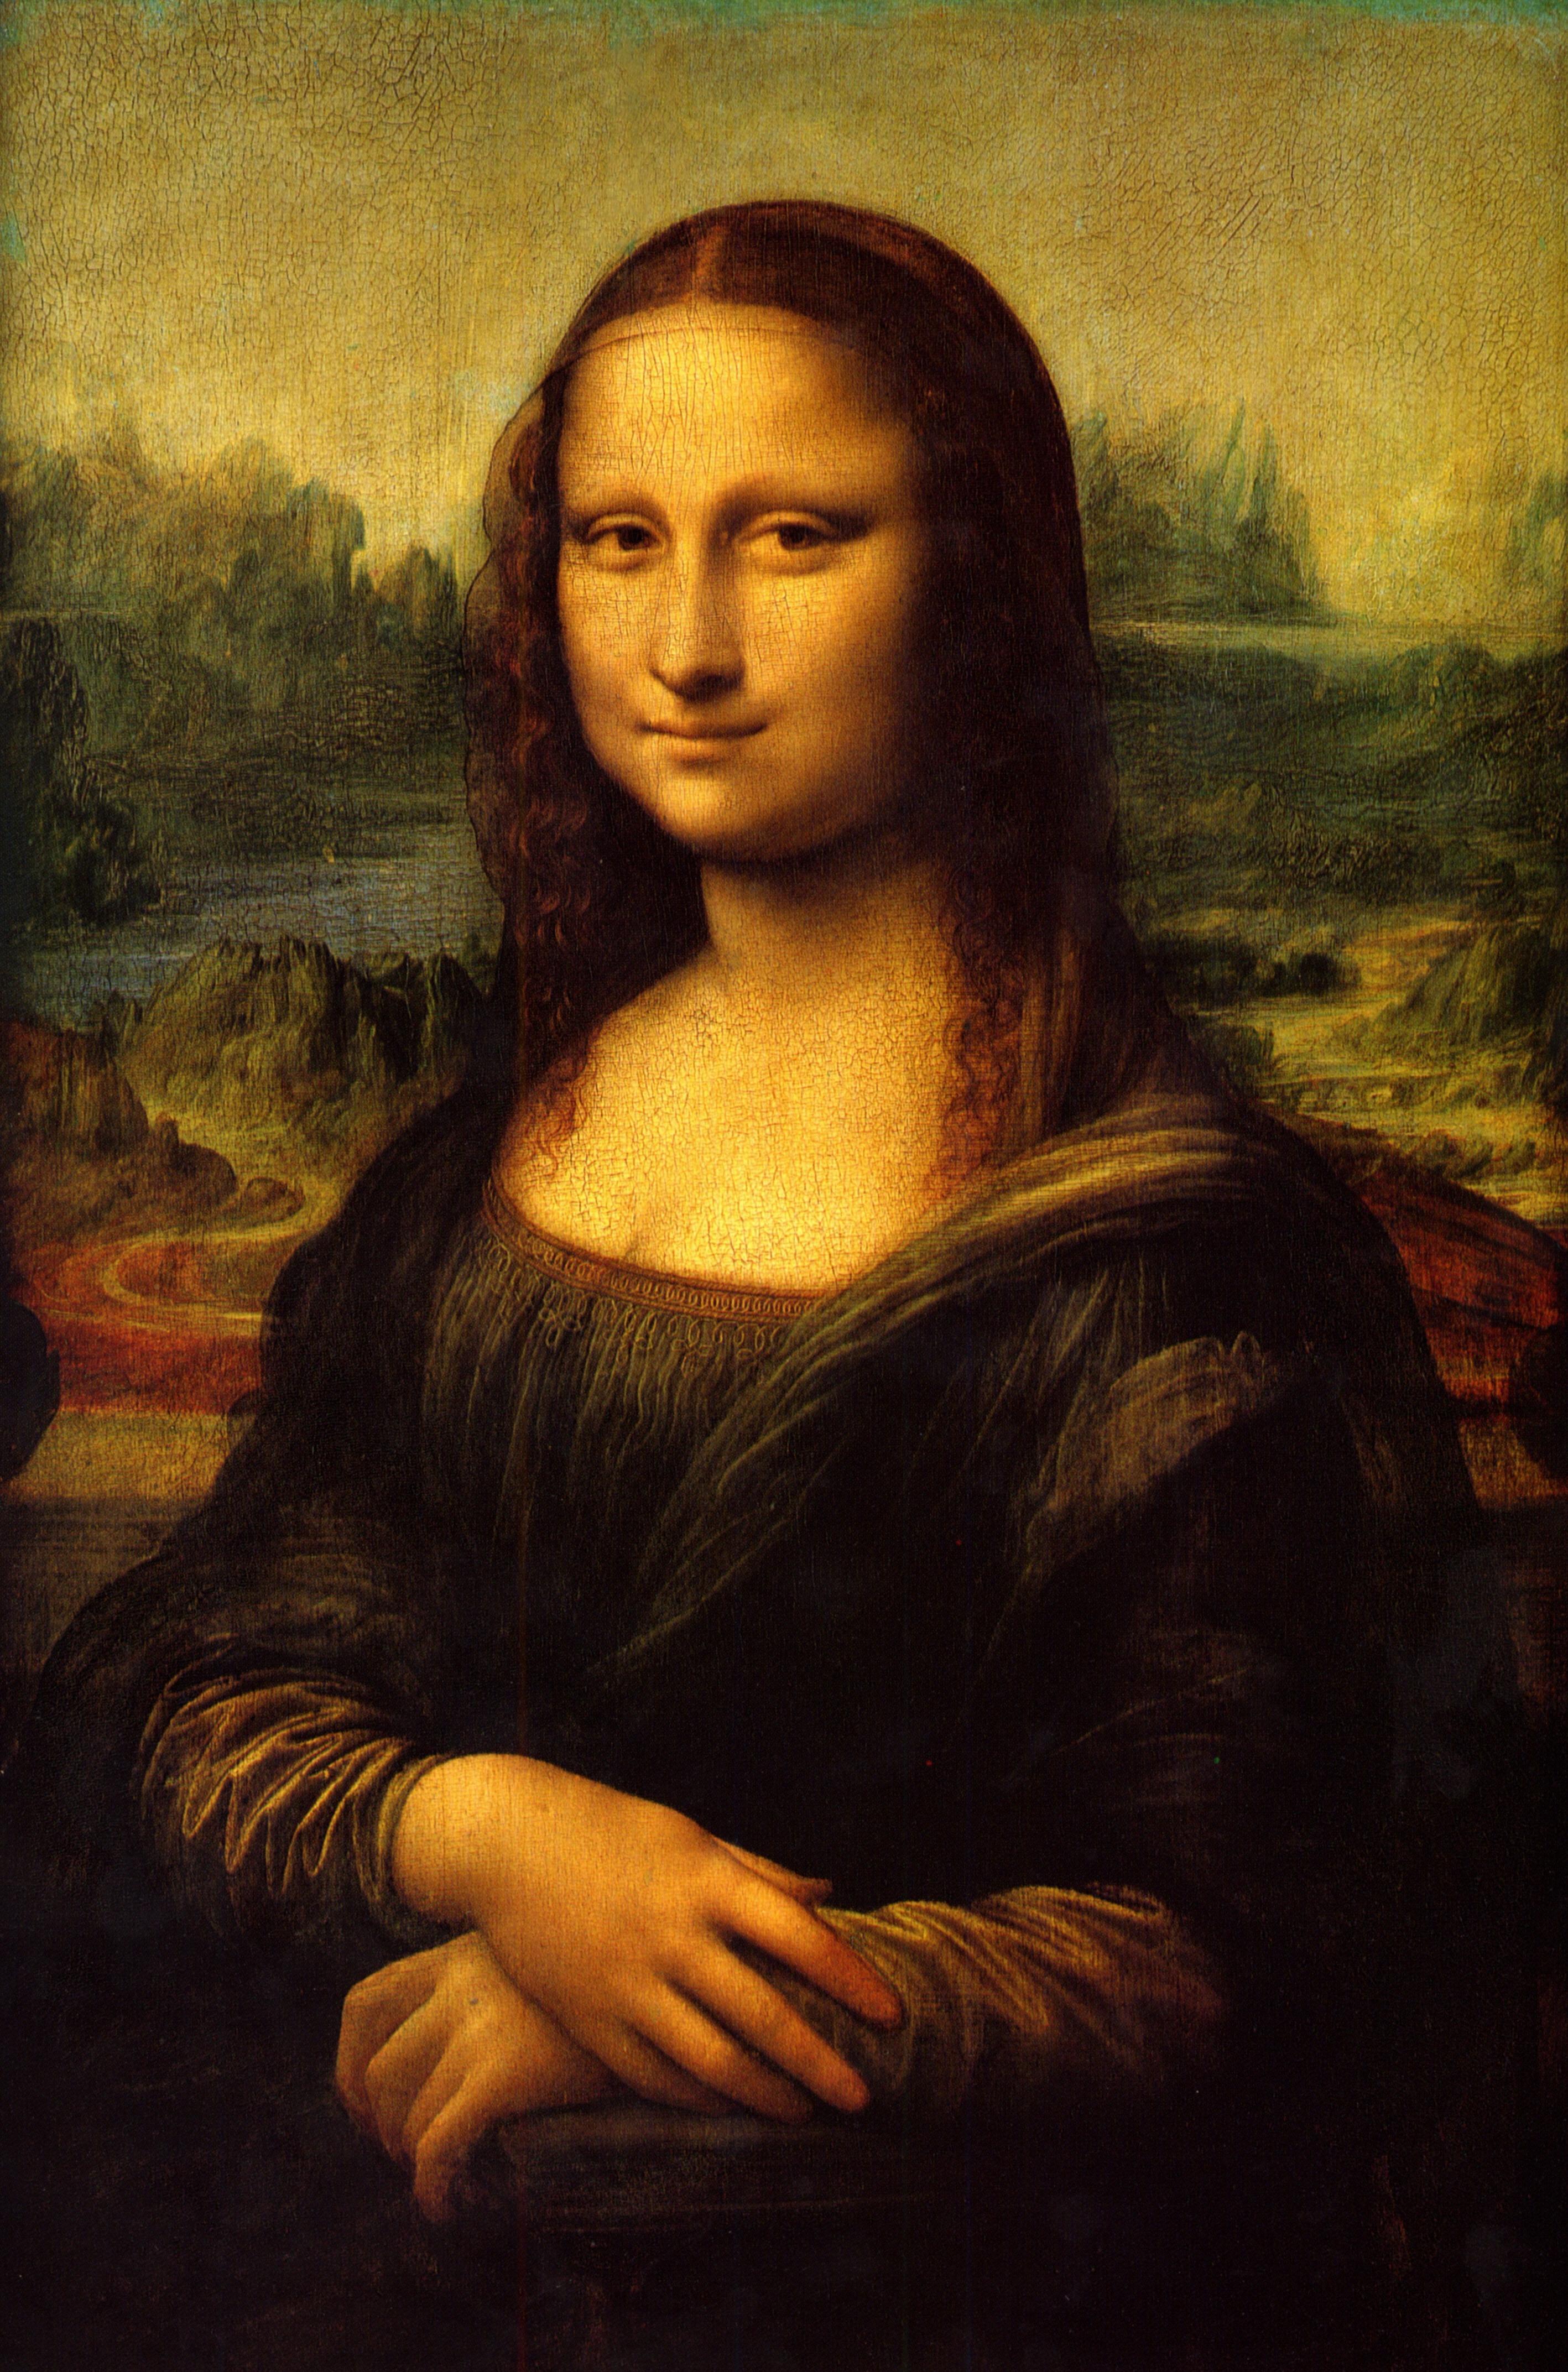 Leoardo da Vinci